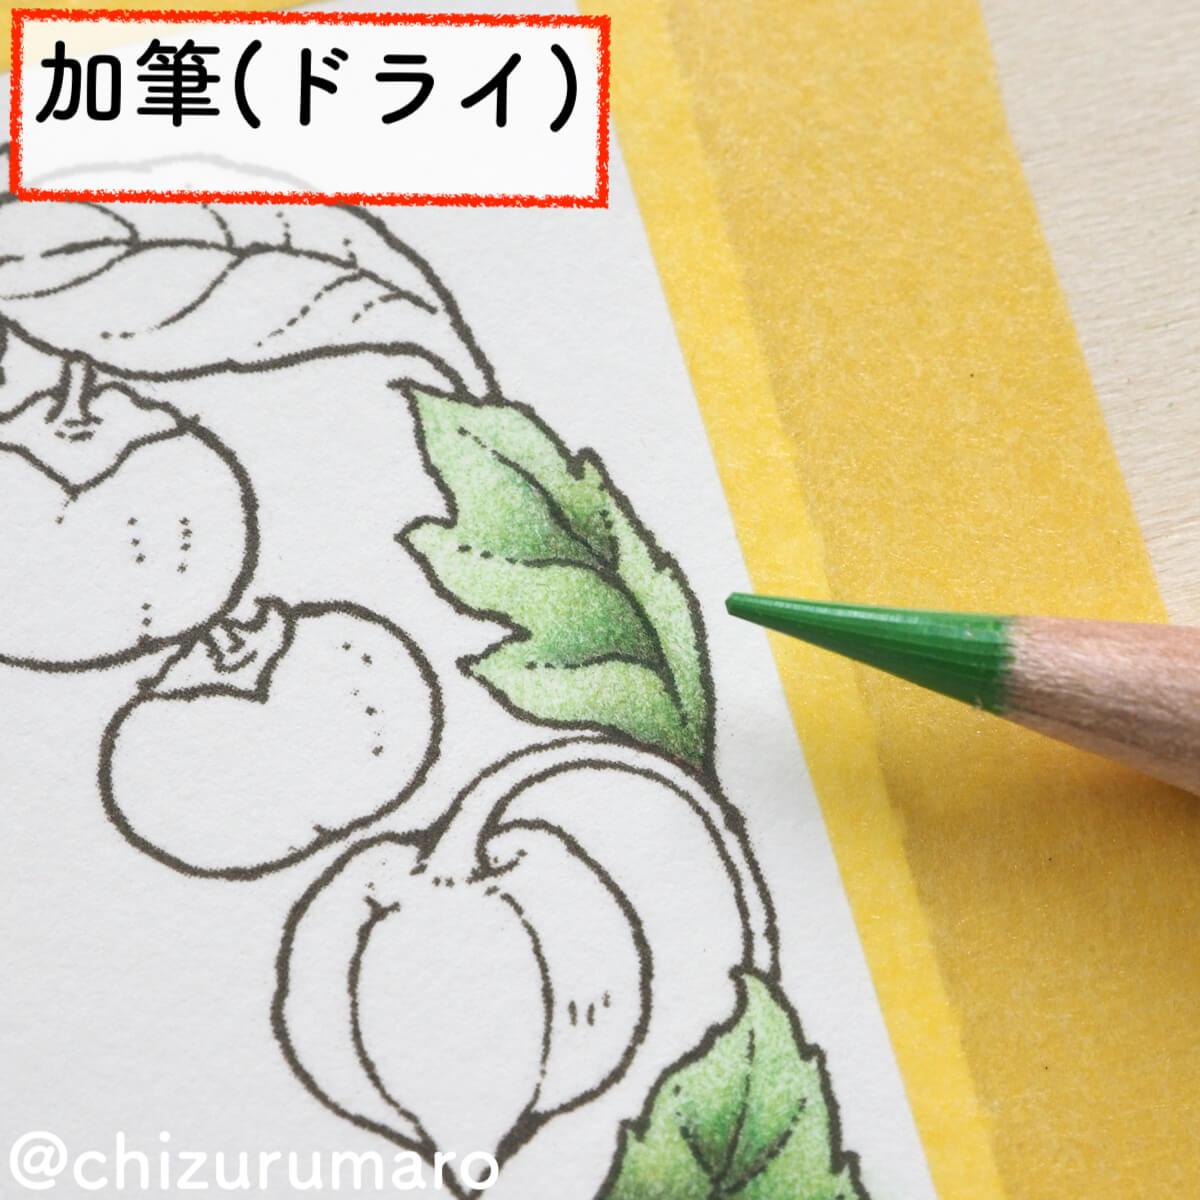 f:id:chizurumaro:20200217145723j:plain